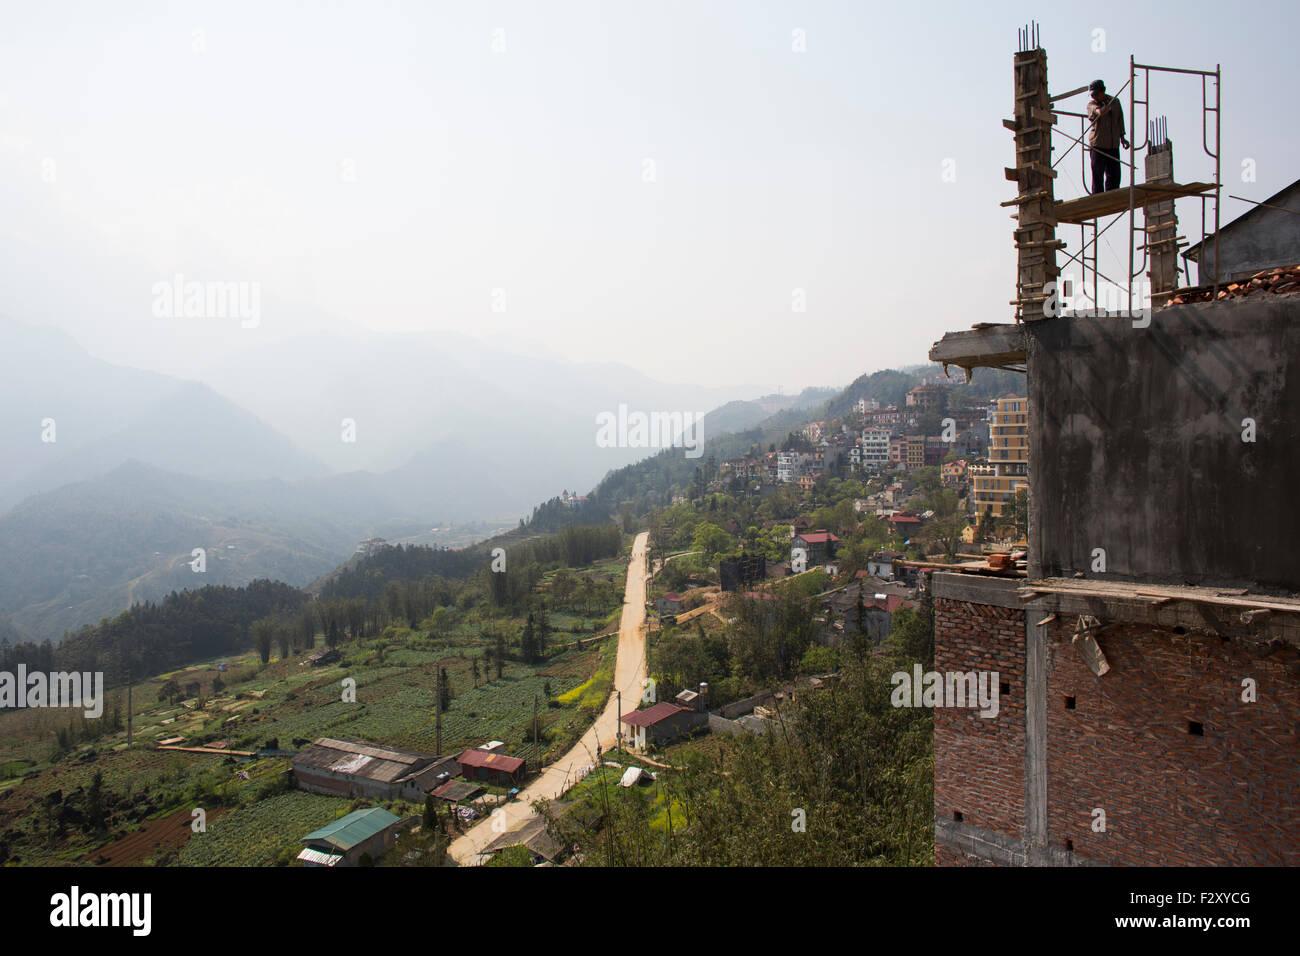 Hotel under construction in Sapa Vietnam - Stock Image